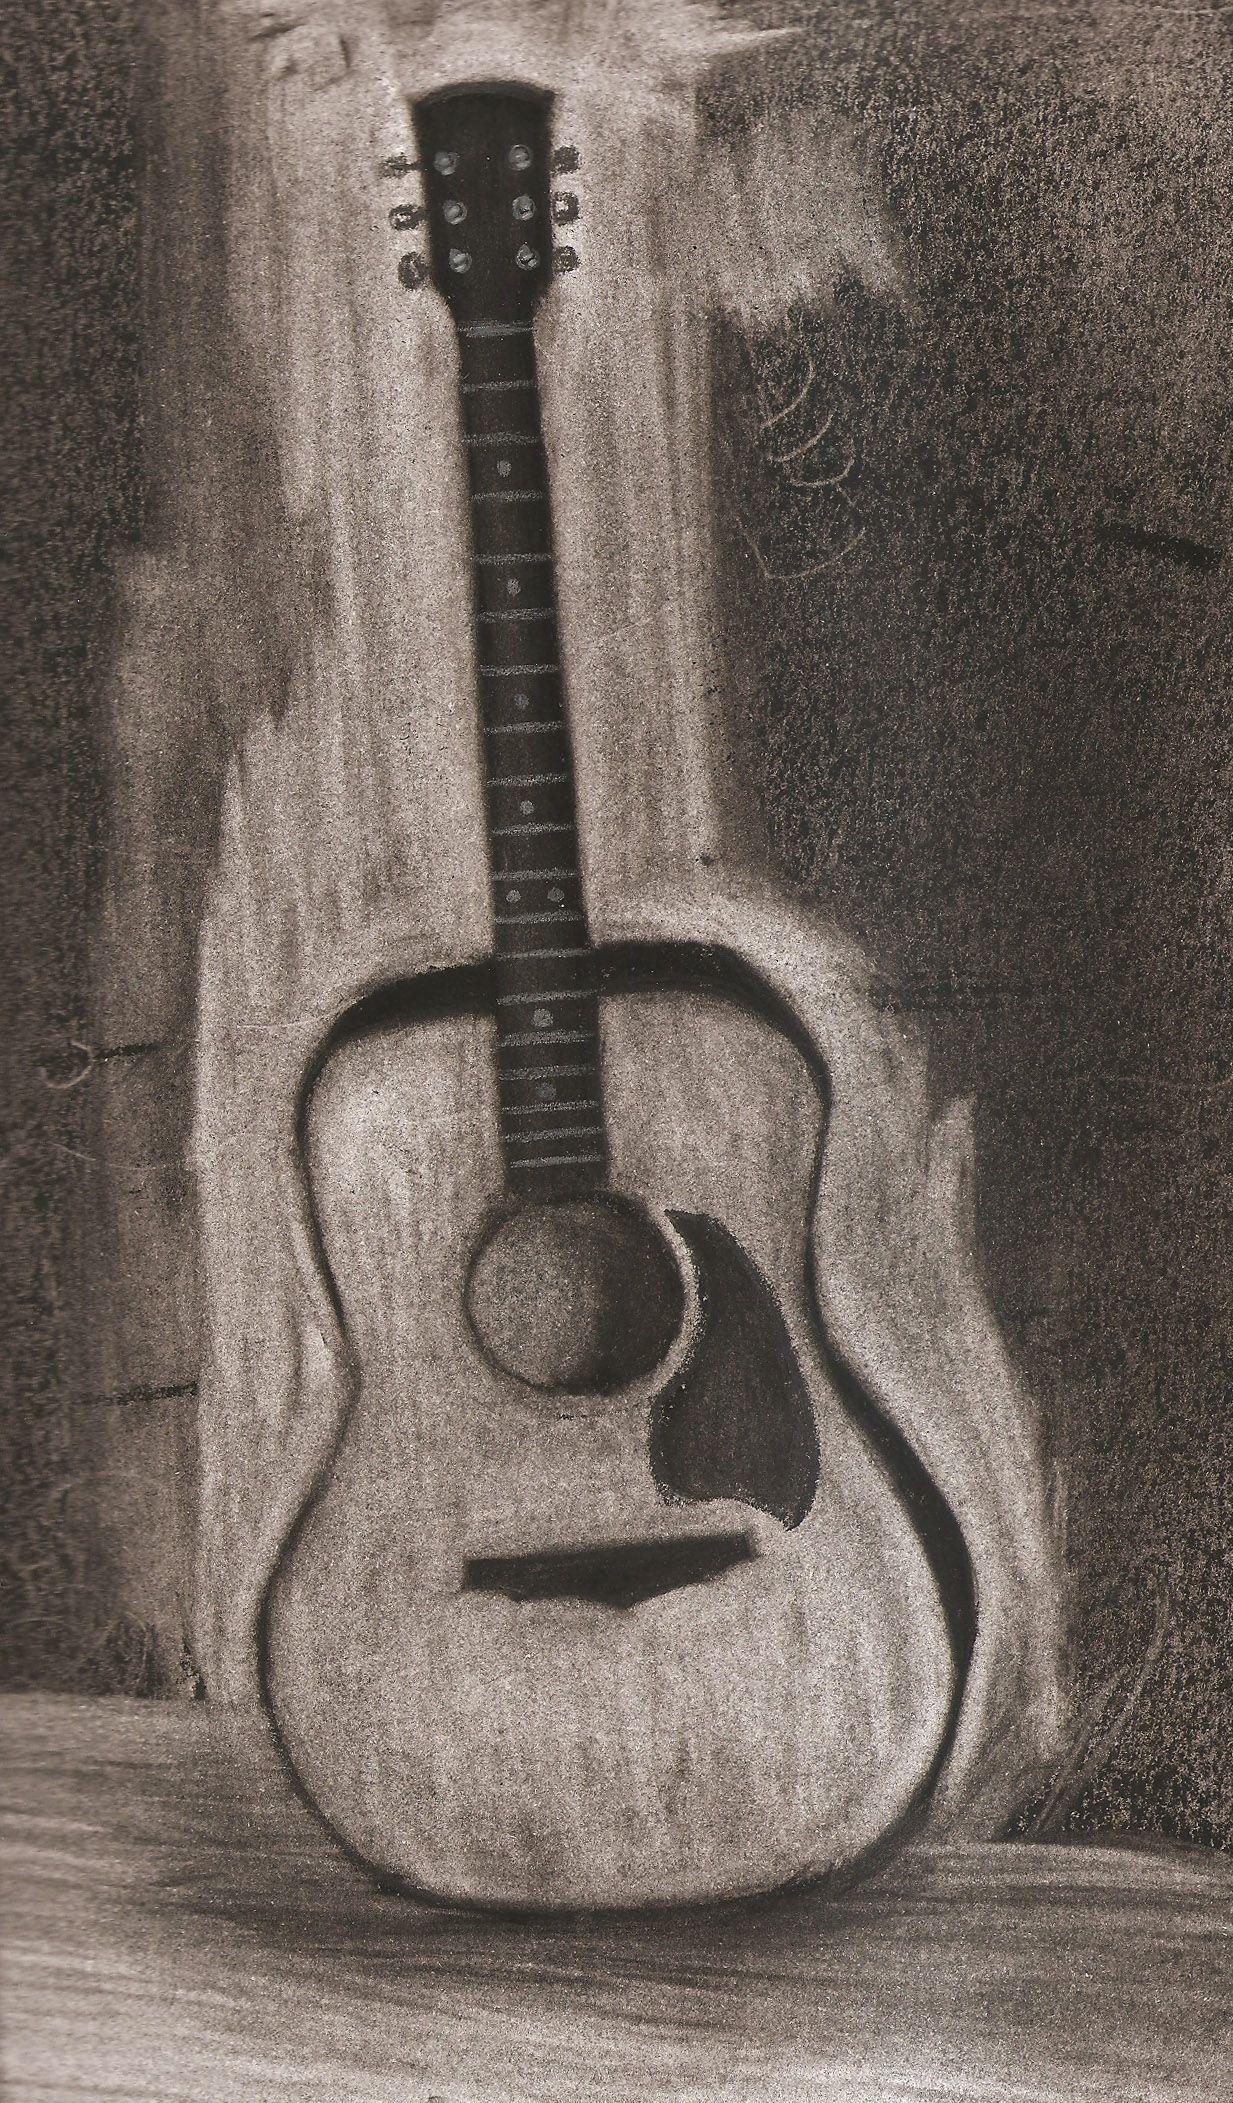 guitar drawing charcoal studio arts guitar artwork inspiration